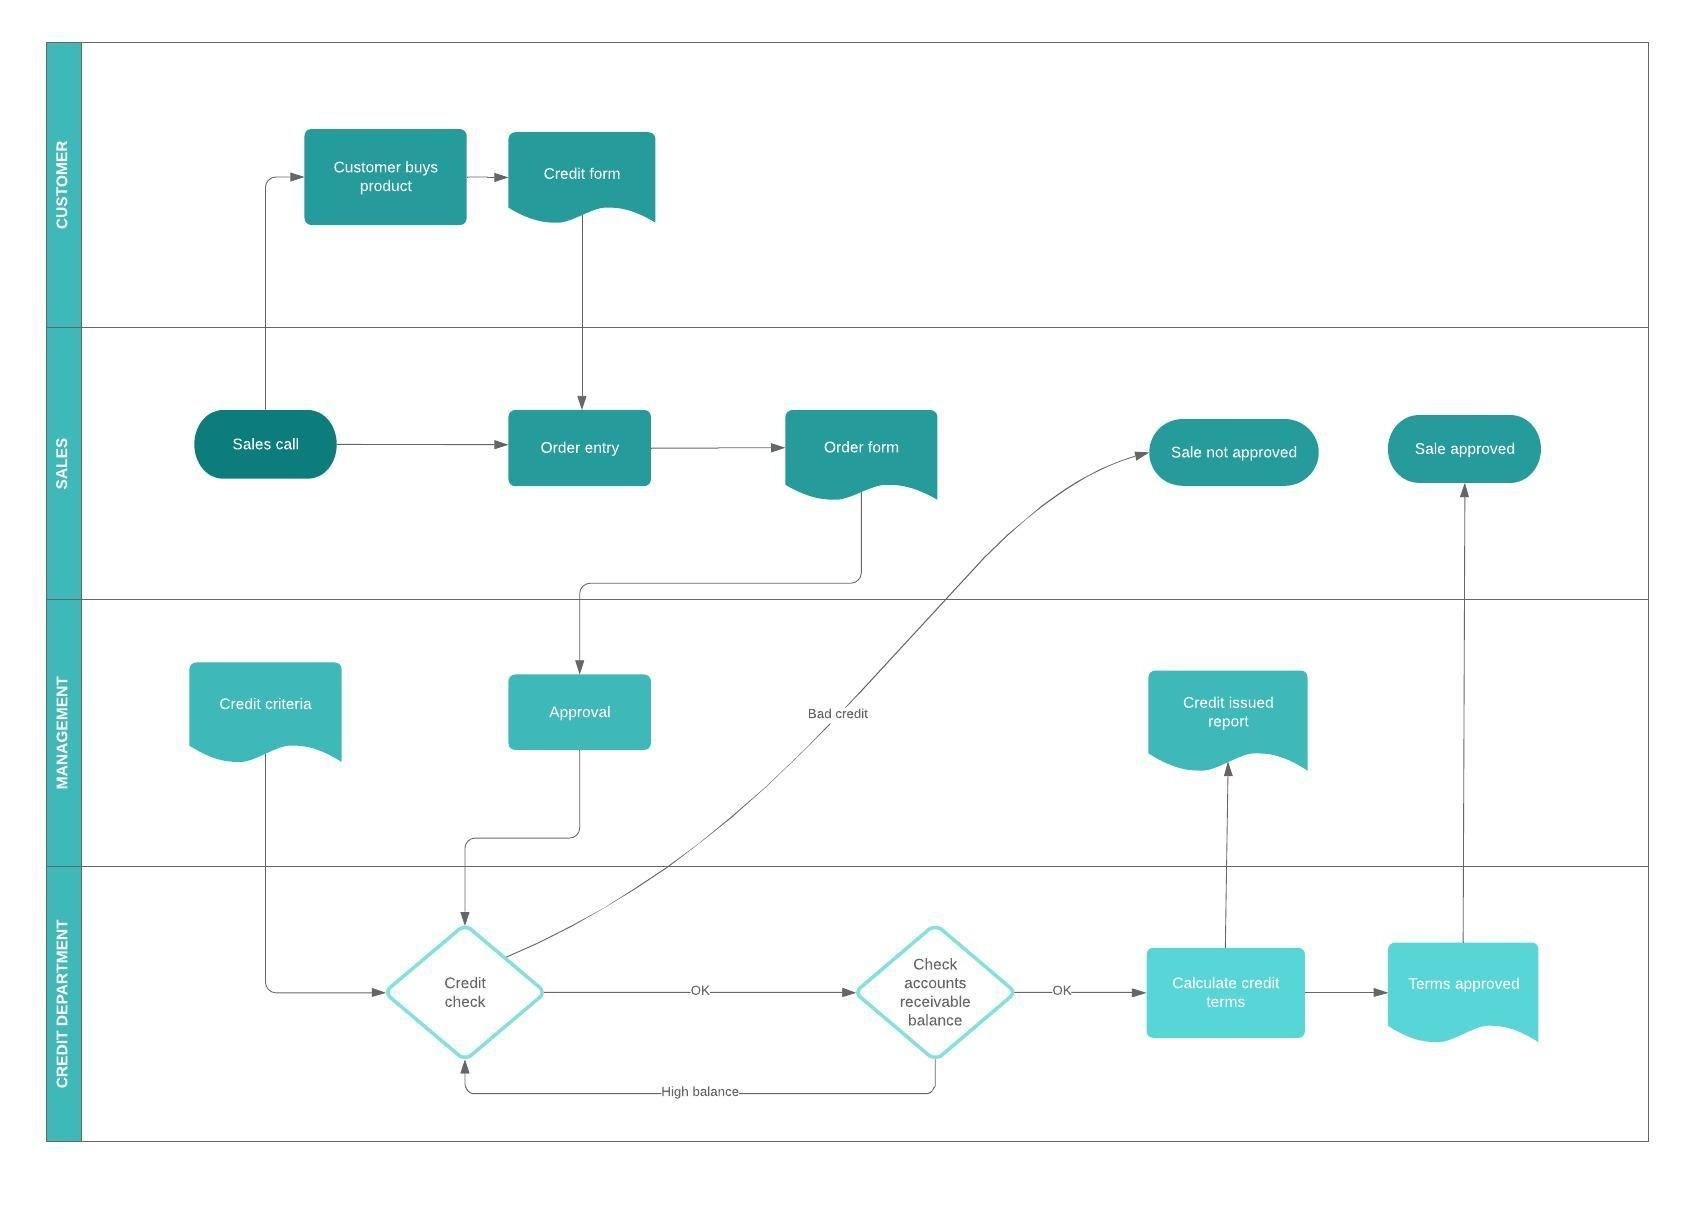 002 Surprising Online Flow Chart Template Image  Flowchart Proces DiagramFull